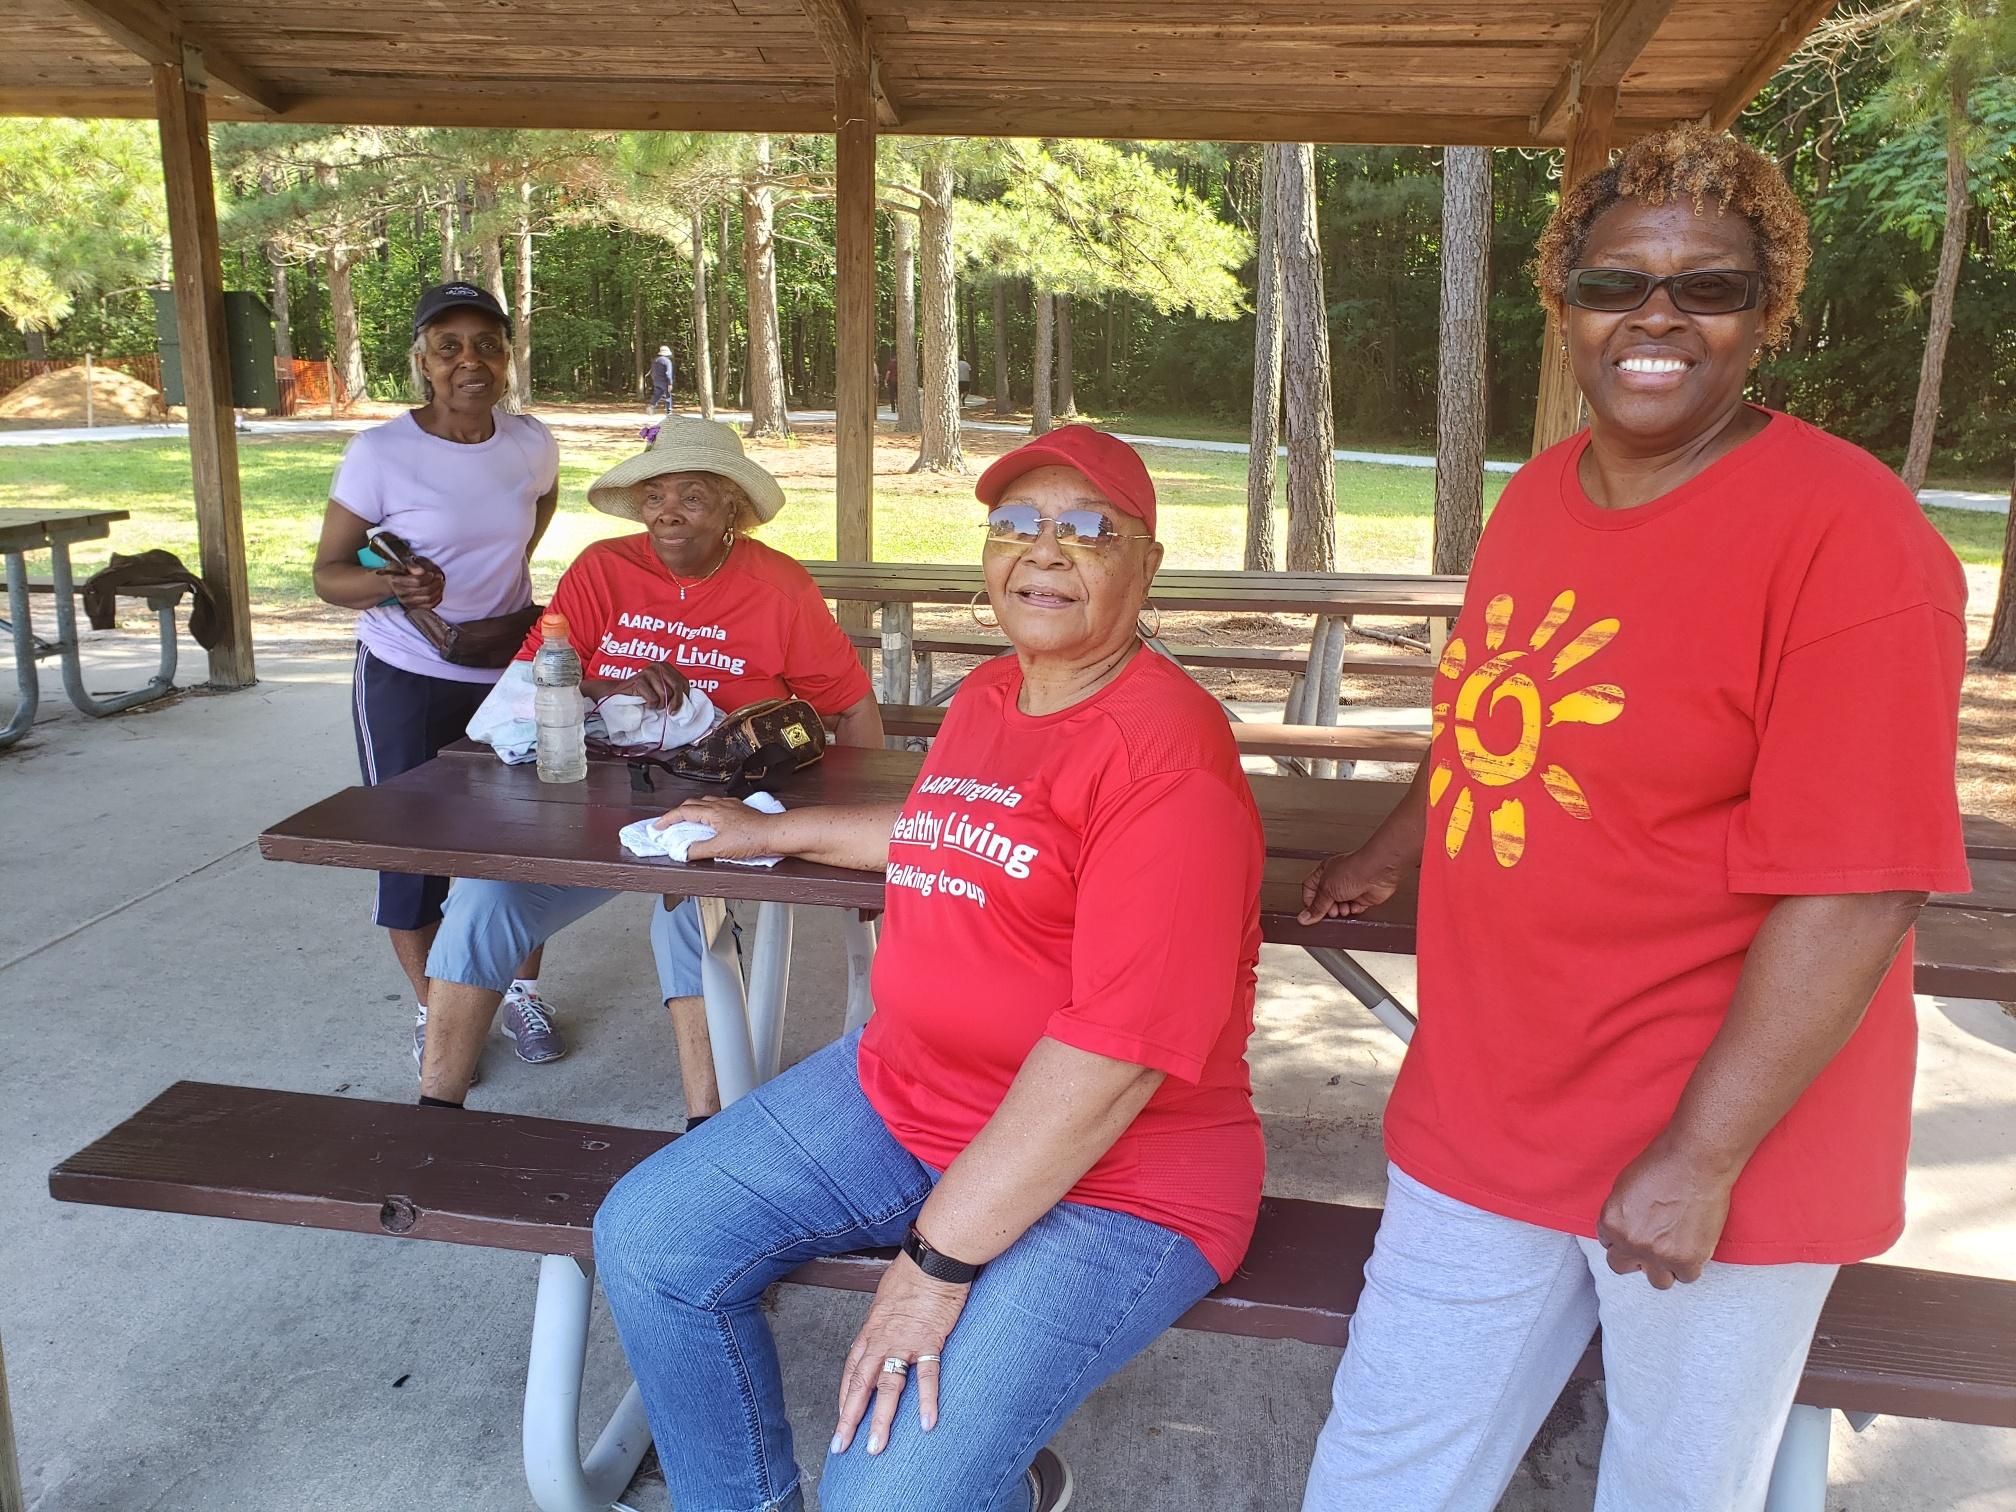 Hampton Roads Walking Group/HR_WalkingGroup 23.jpg